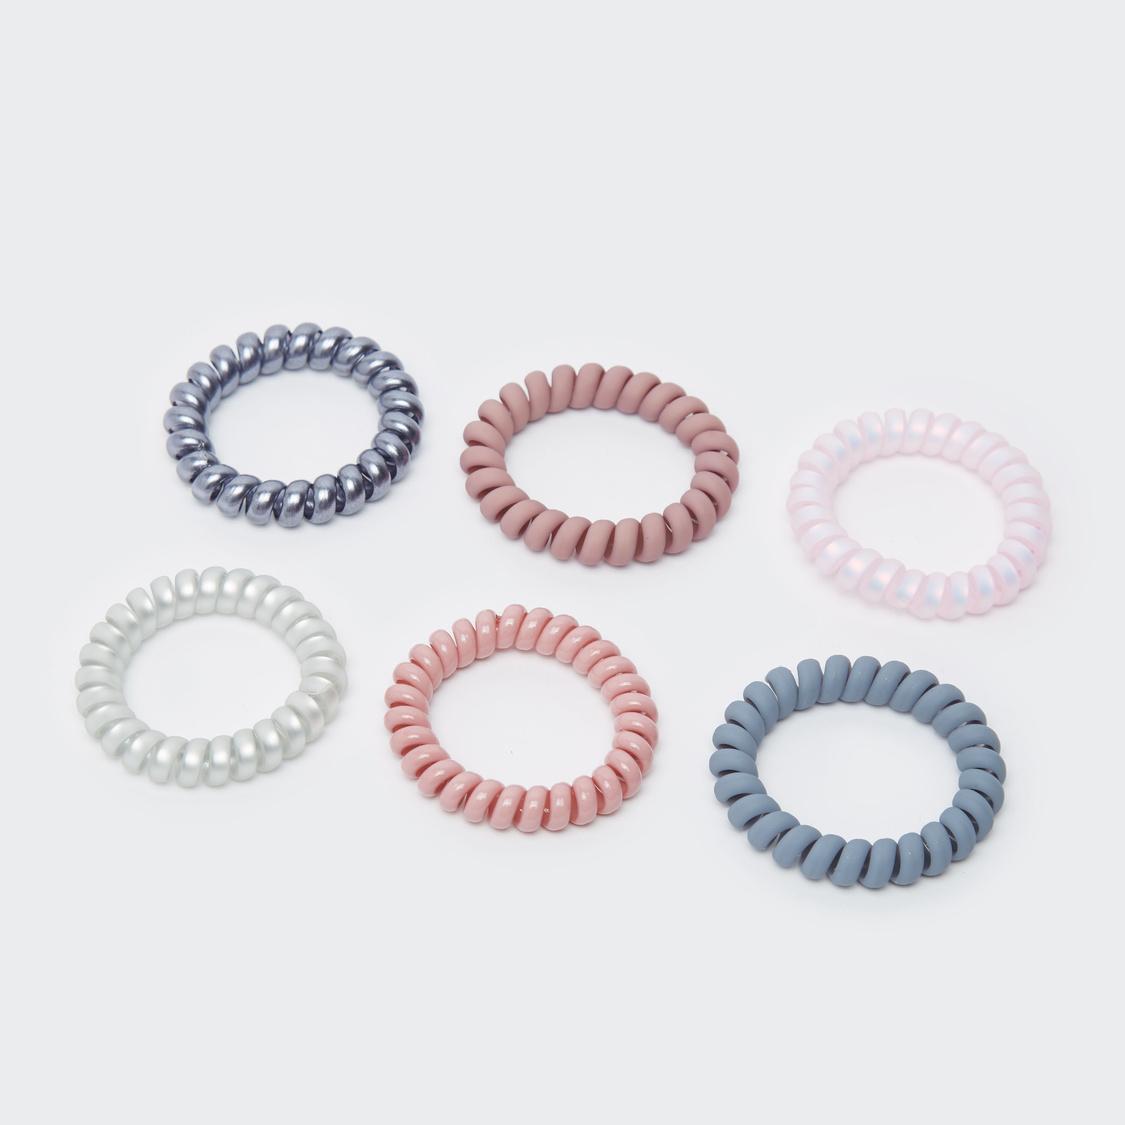 Set of 6 - Spiral Elastic Round Bands